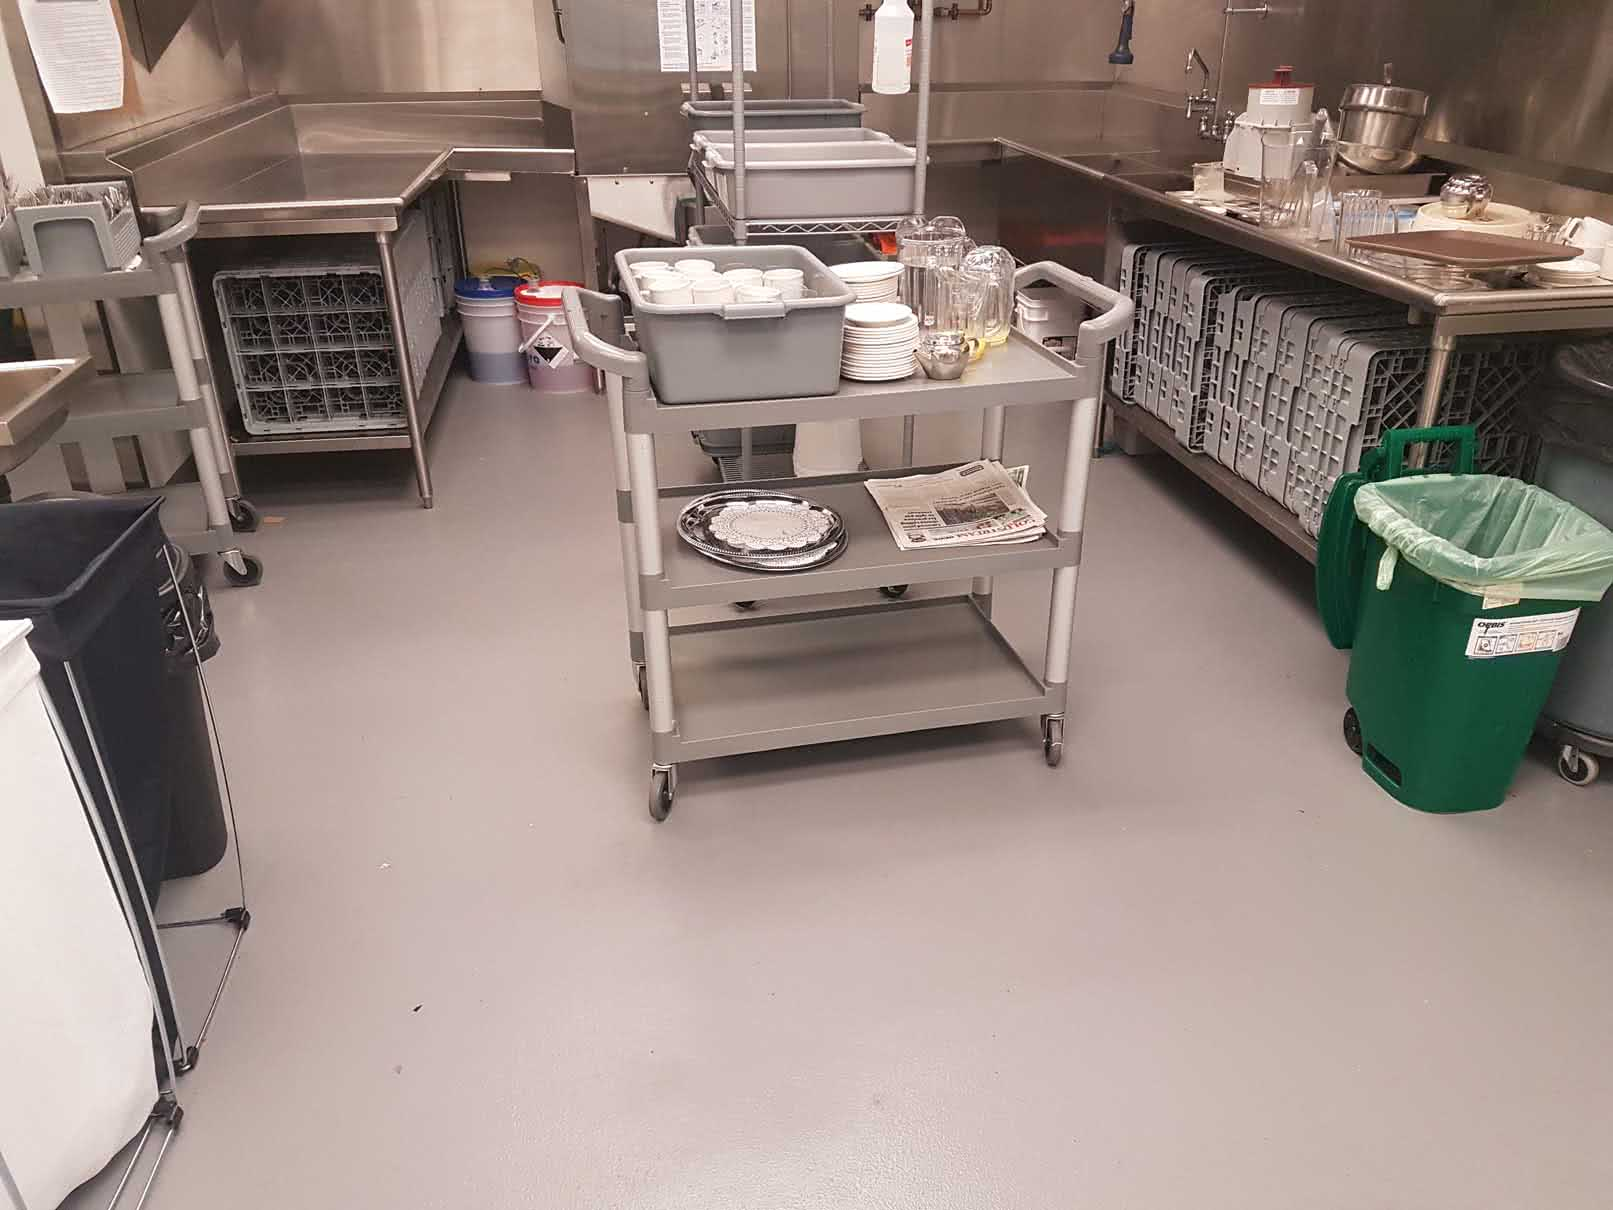 Epoxy Floor Resurfacing & Coating at Cherish Assisted Living